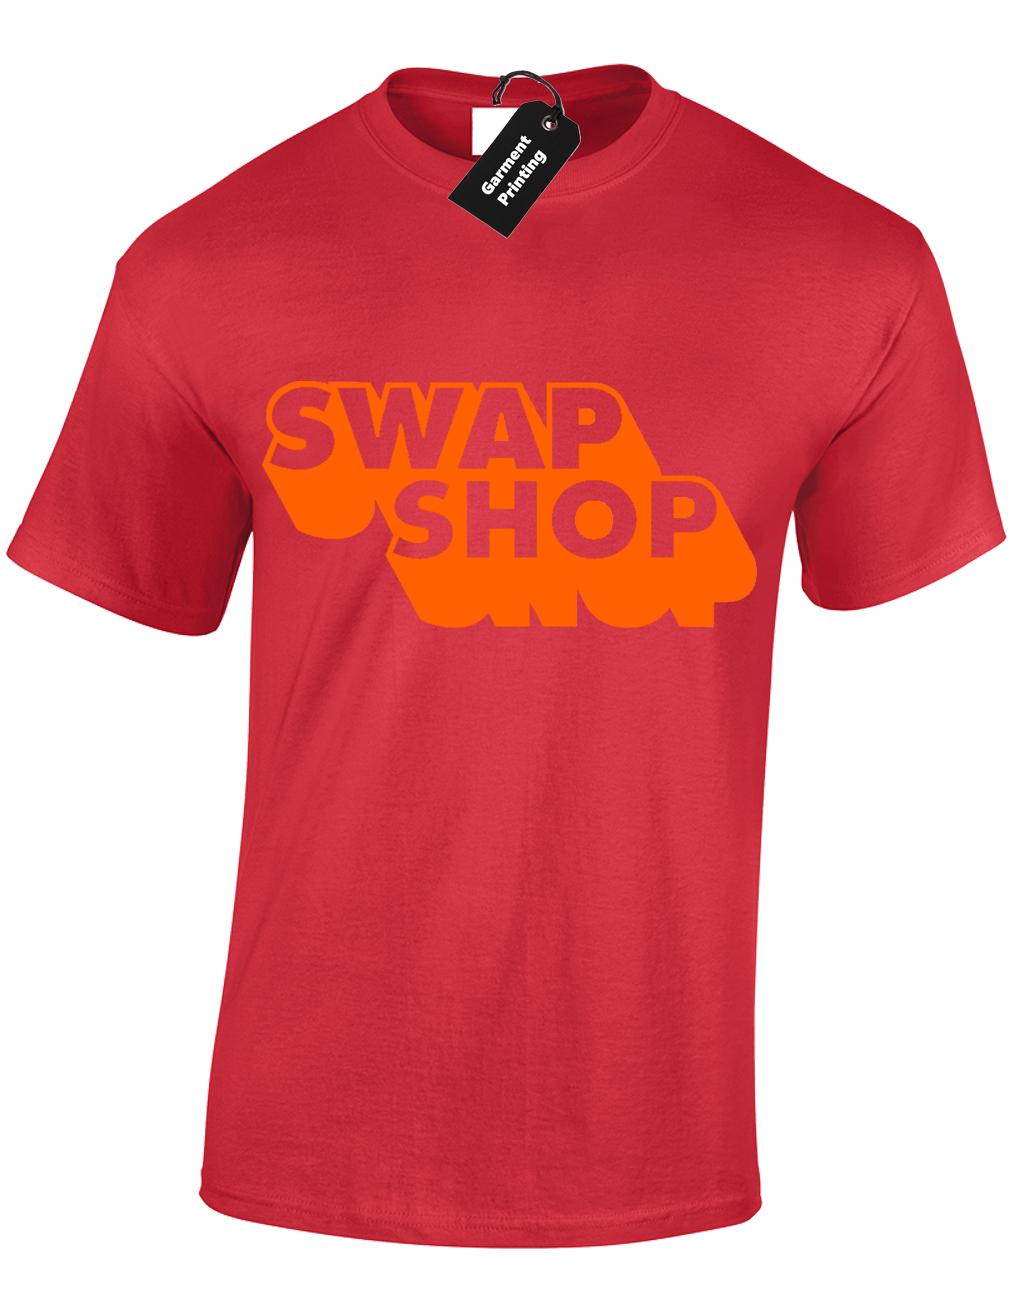 SWAP SHOP MENS T SHIRT FUNNY RETRO SATURDAY MORNING TV KIDS CLASSIC 70/'S 80/'S